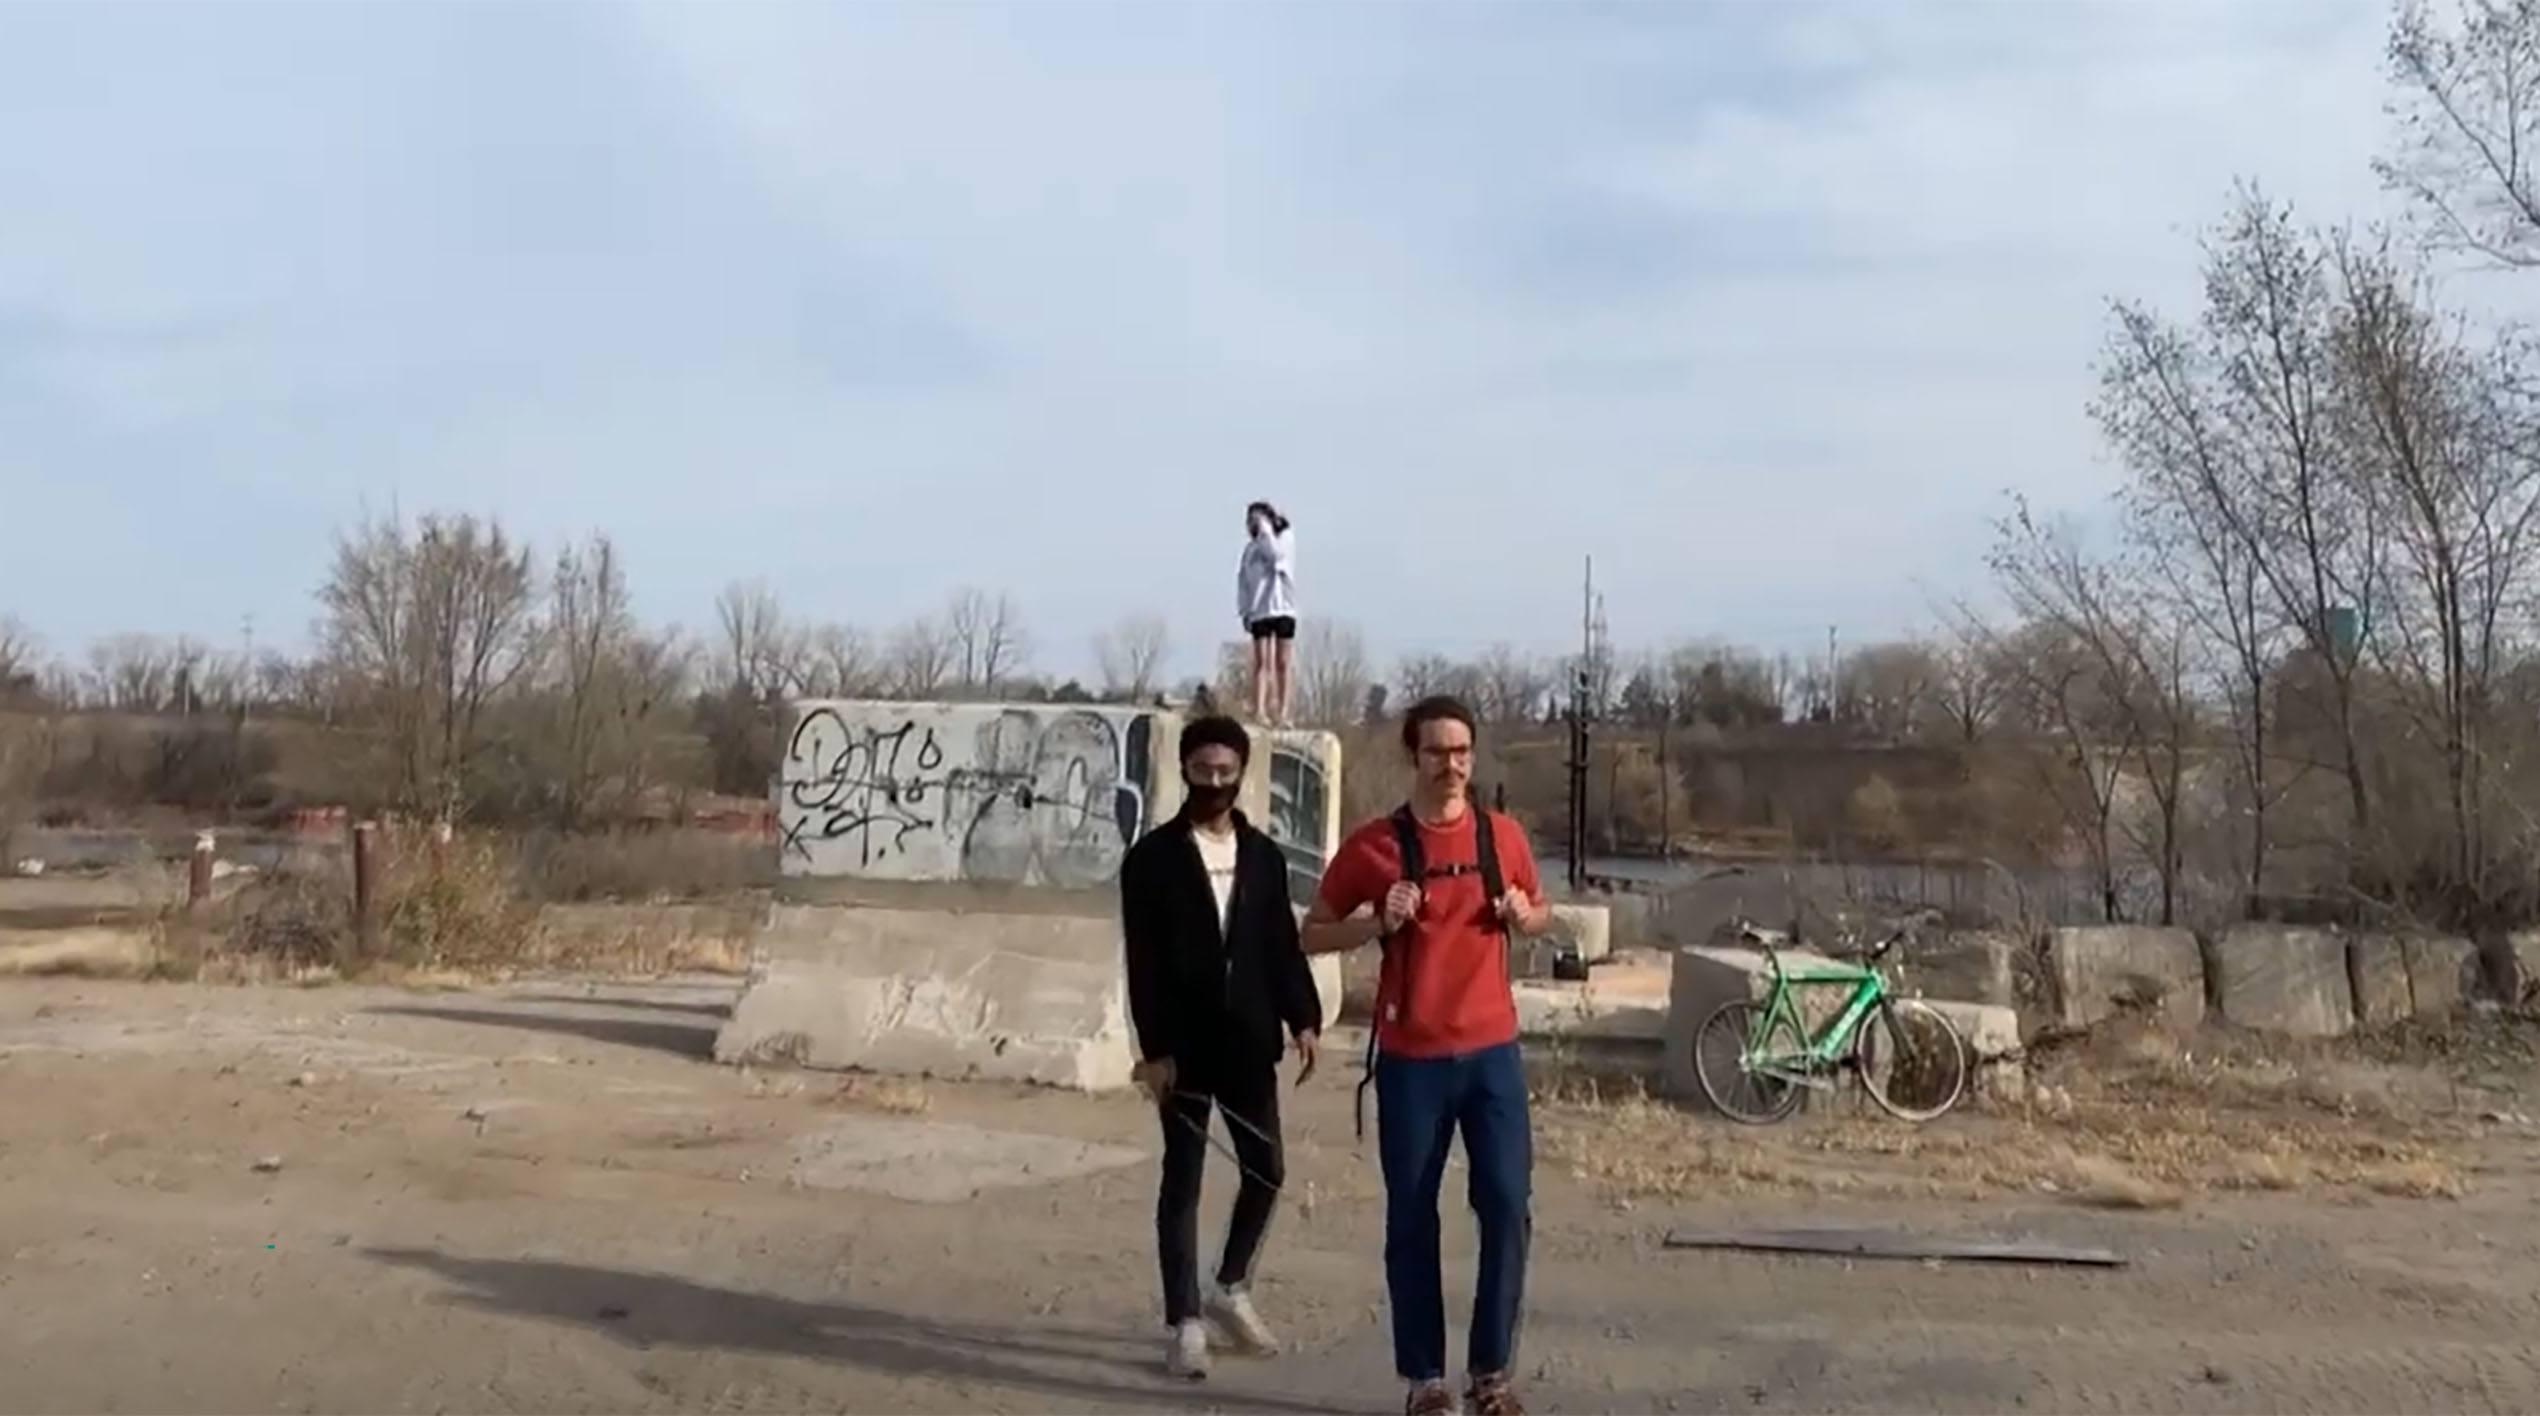 uht-video-tour-image